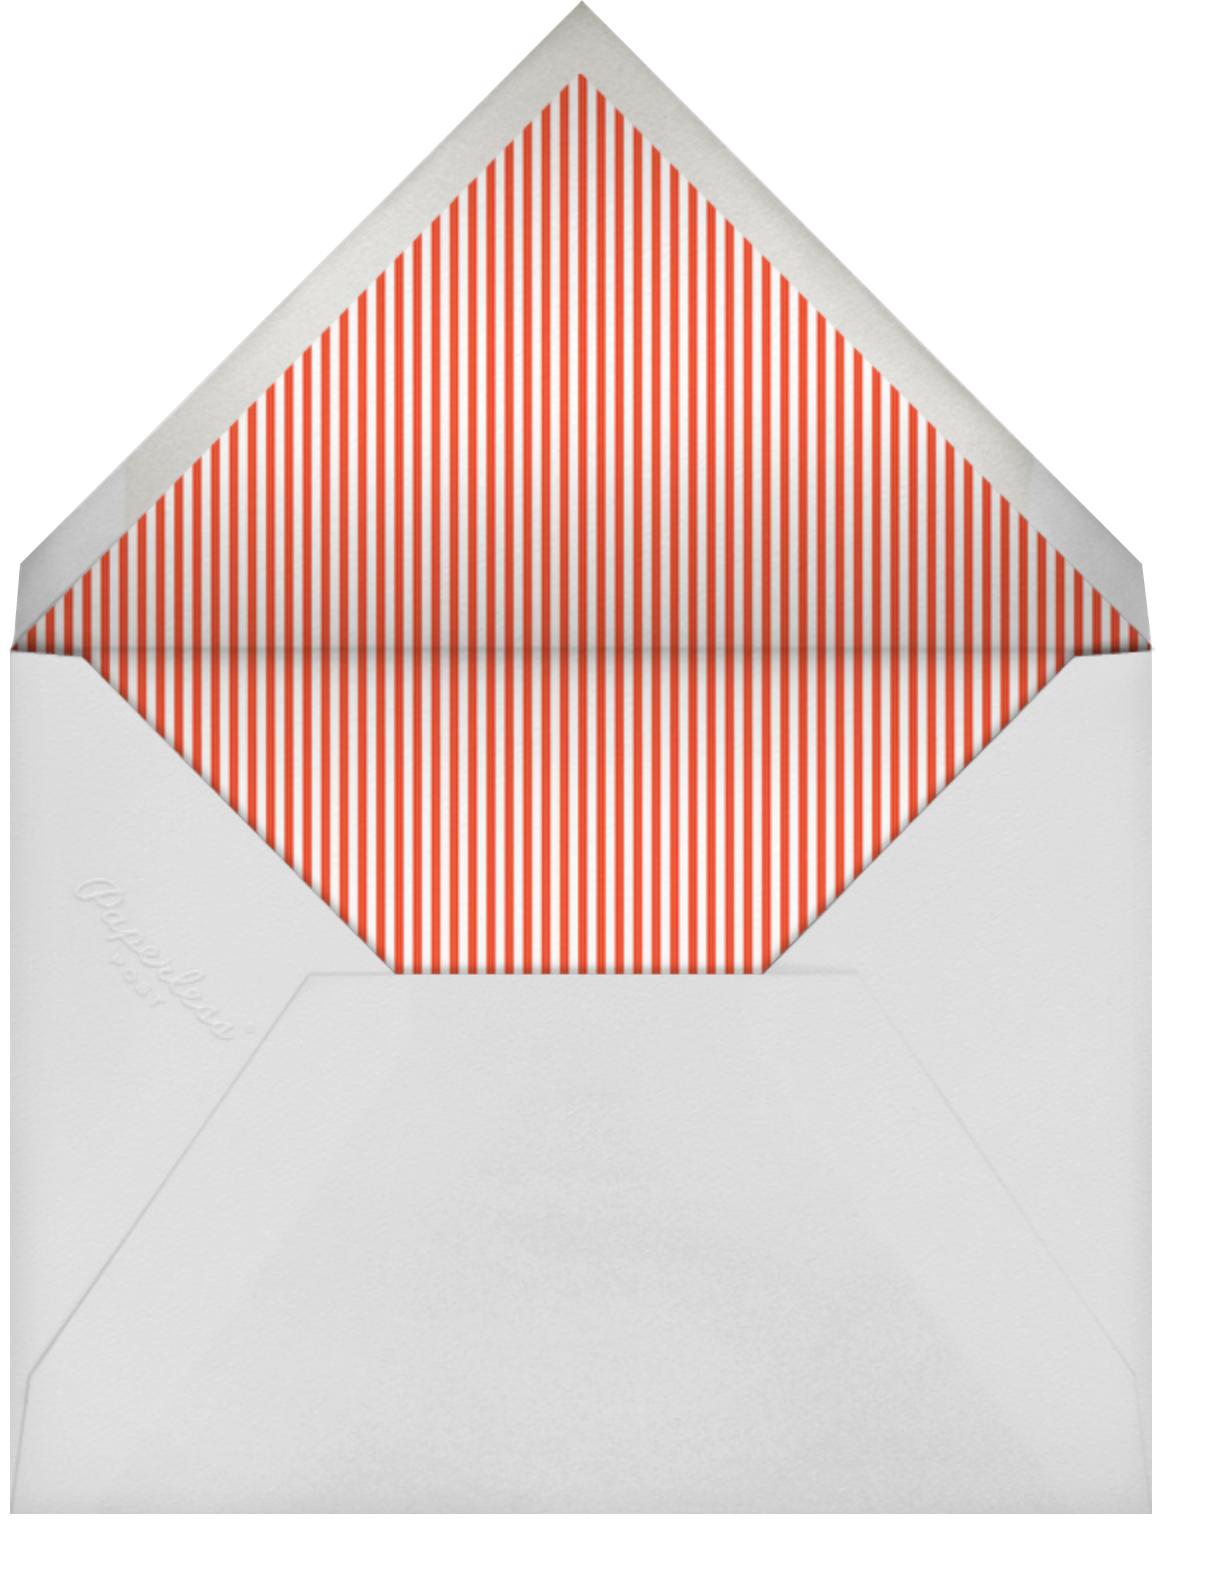 Light It Up Photo - Mr. Boddington's Studio - Holiday cards - envelope back